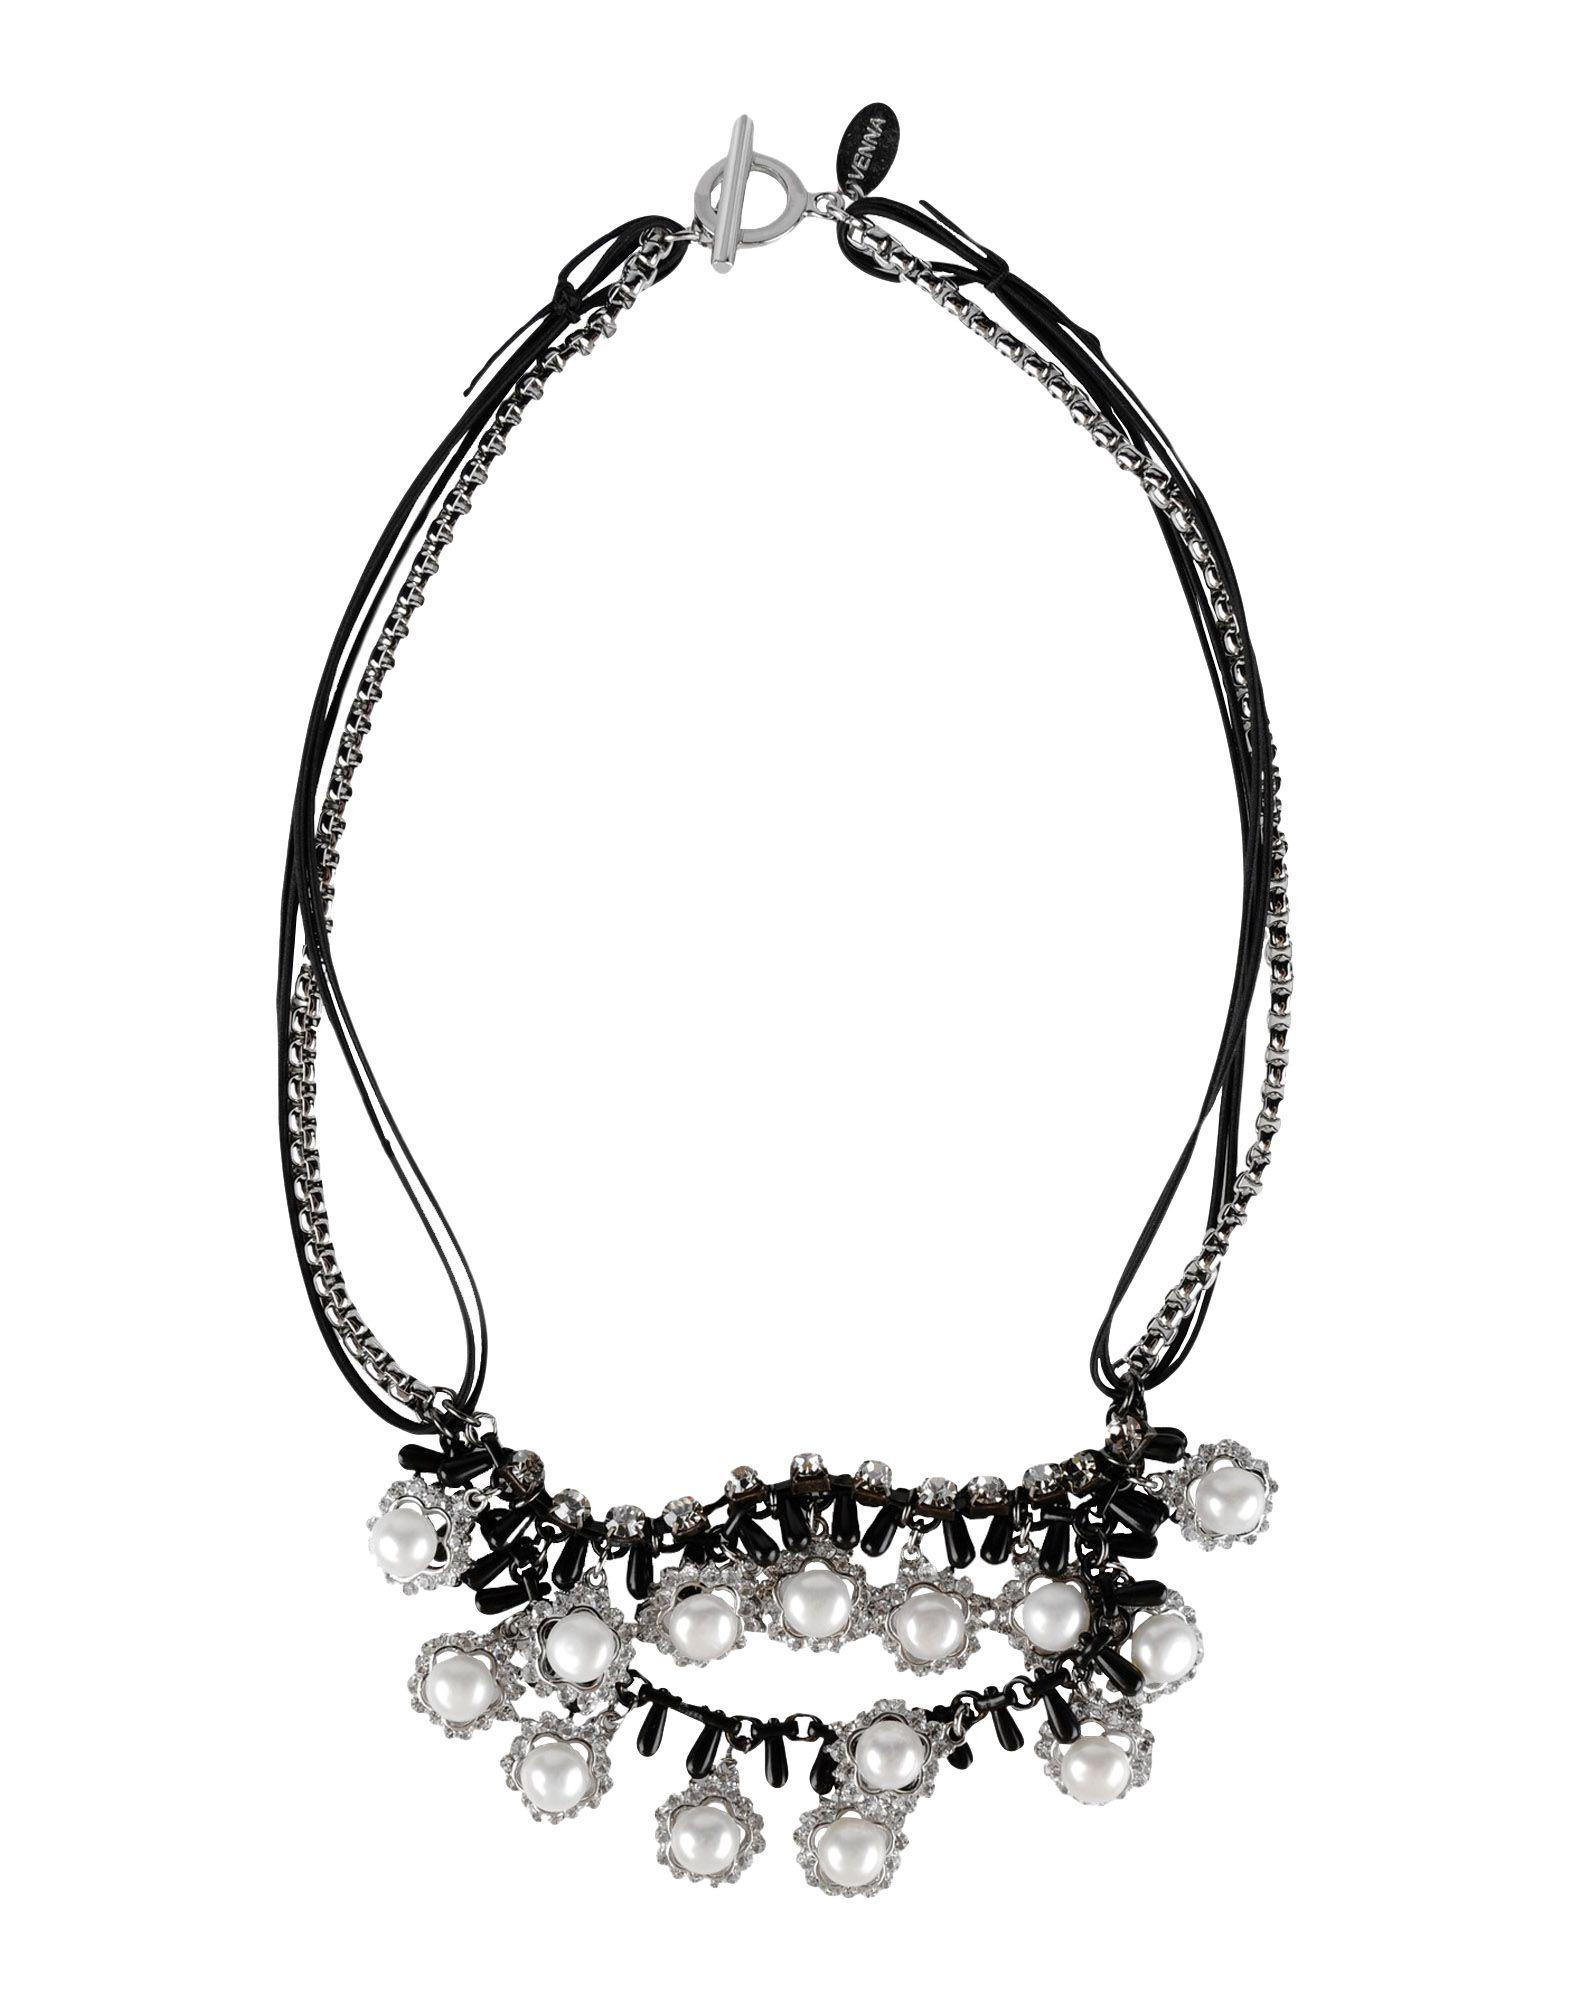 VENNA Necklace in Silver